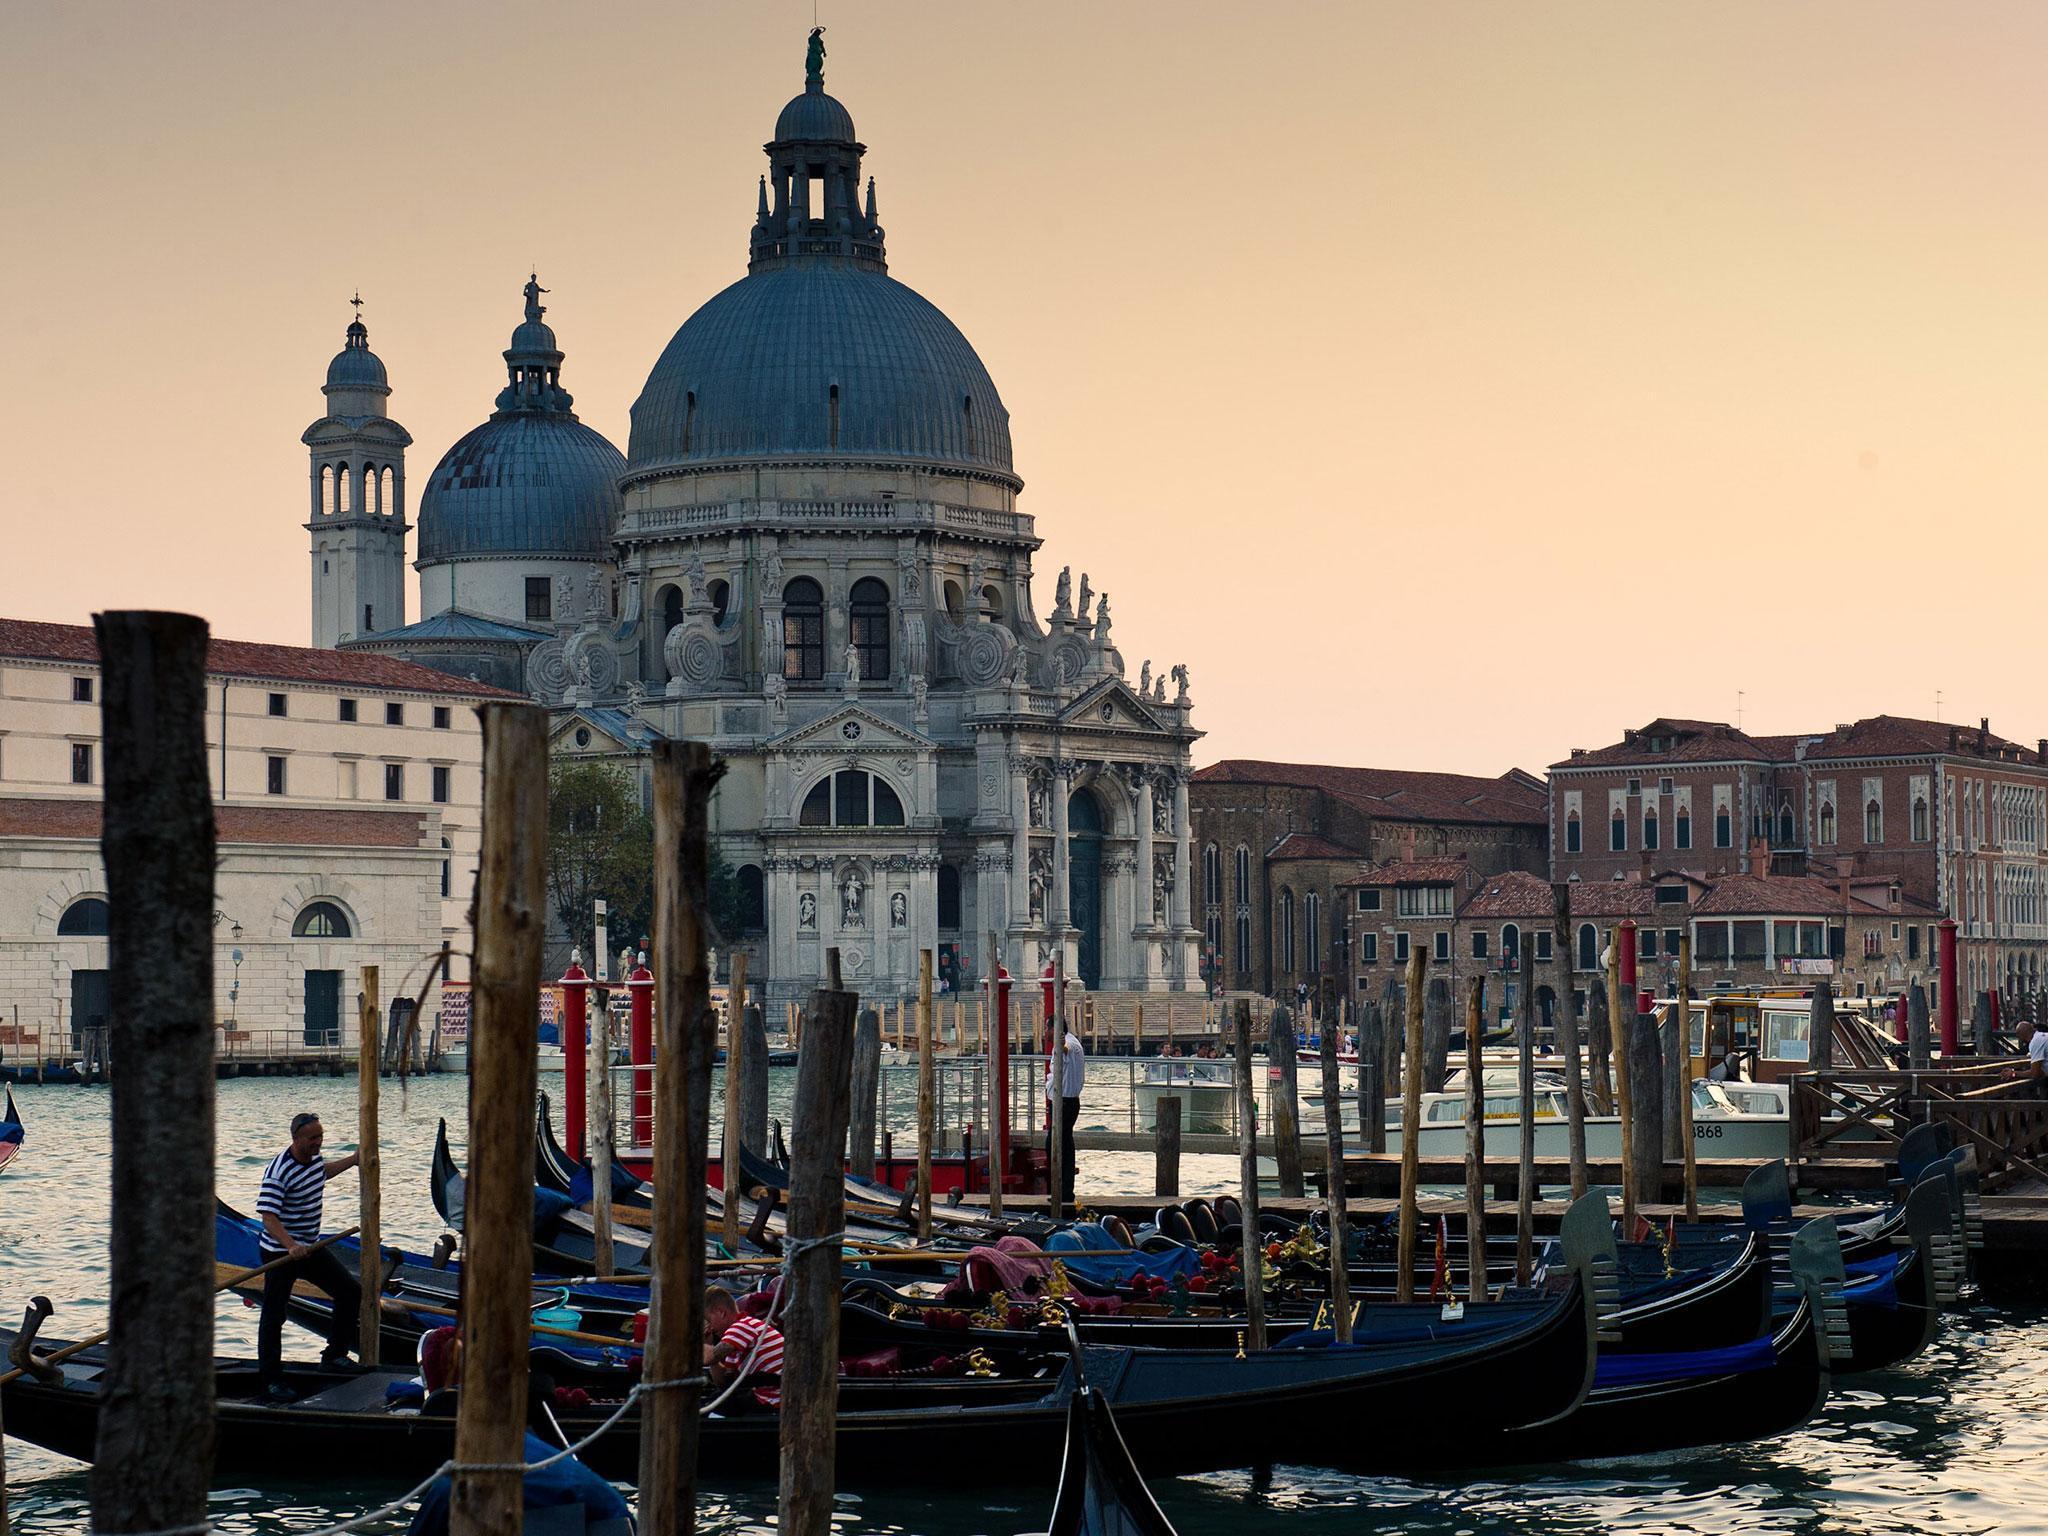 The 19 most popular European honeymoon destinations